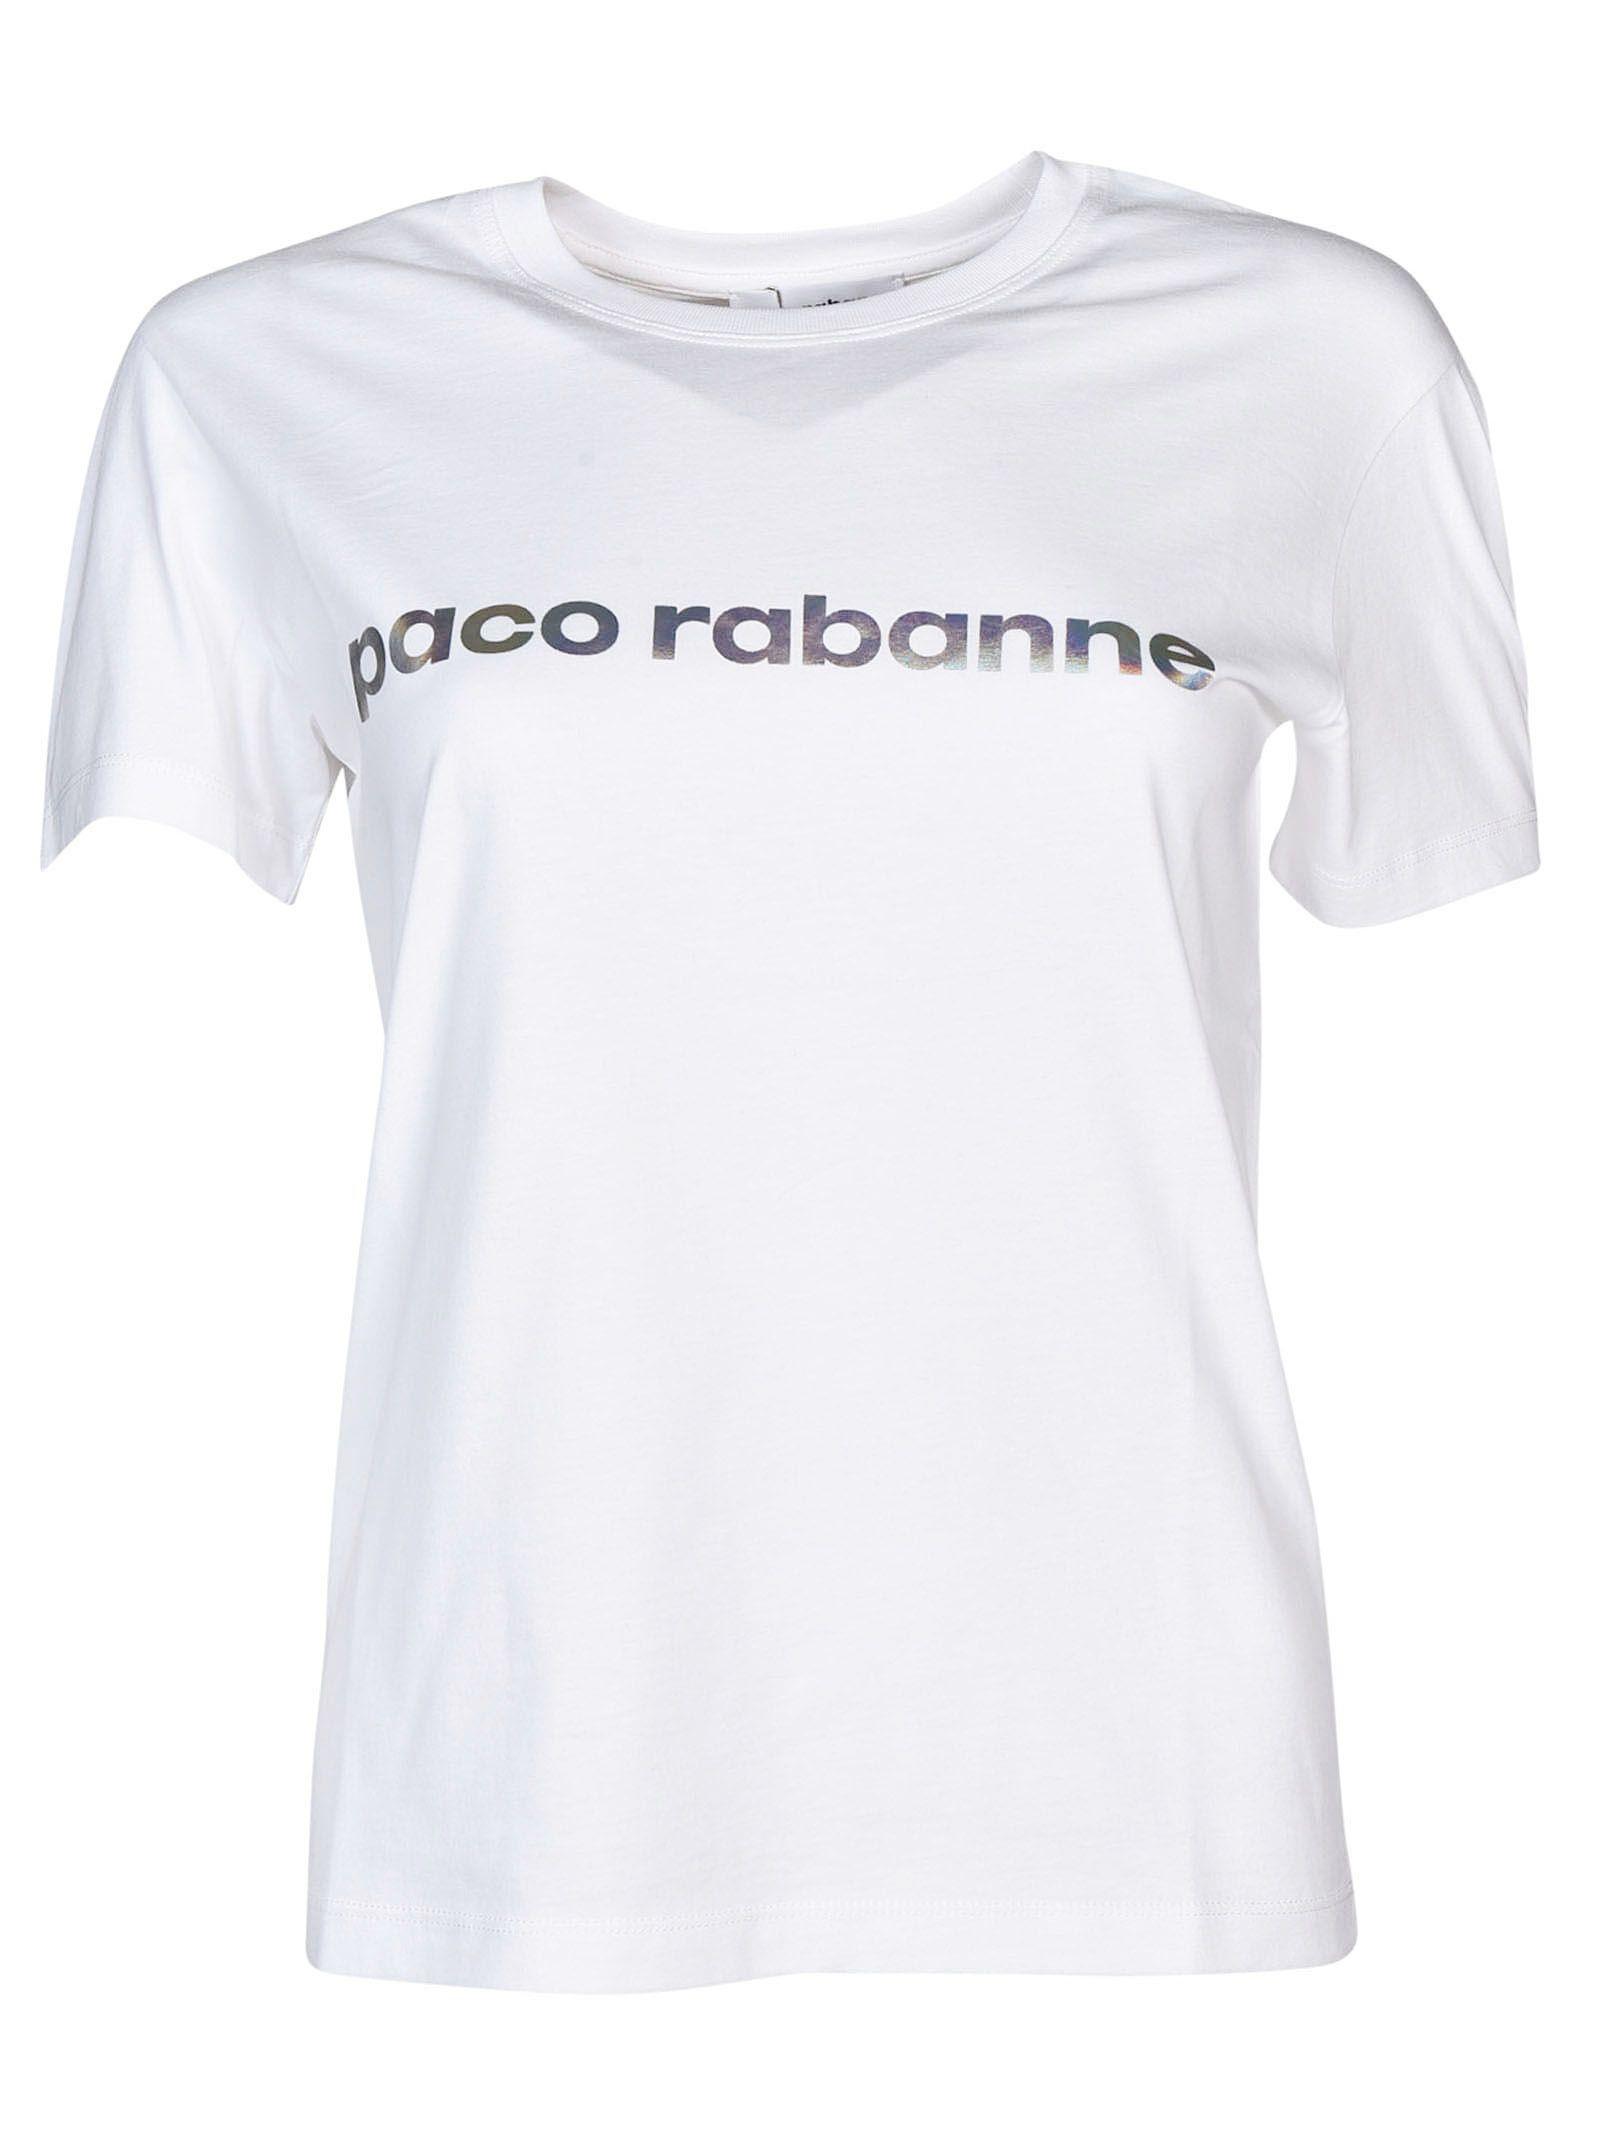 Paco Rabanne Brand Print T-shirt